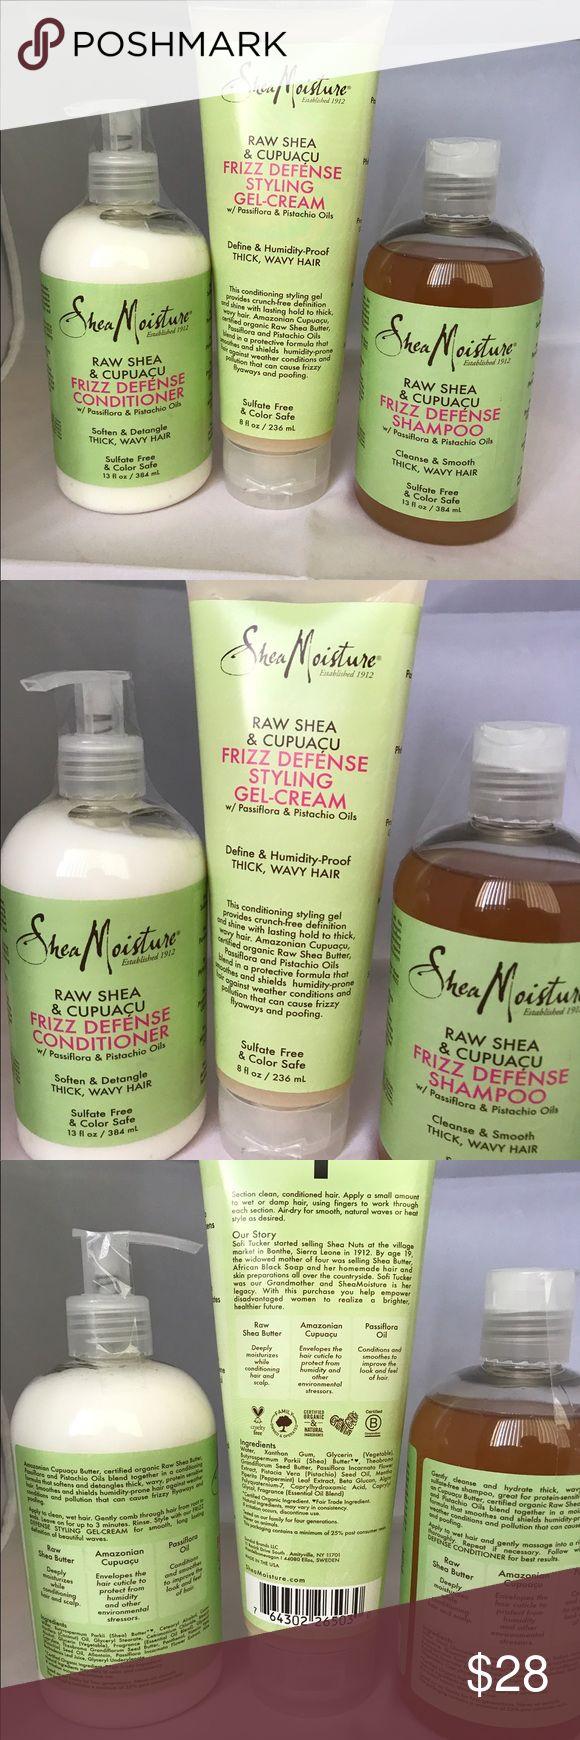 Shea Moisture Trio Shea Moisture Raw Shea &  Capuacu Frizz Defense Styling Gel-Cream (8 fl oz), Conditioner (13 fl oz), and Shampoo (13 gl oz).  trades. Only reasonable offers considered. Shea Moisture Other